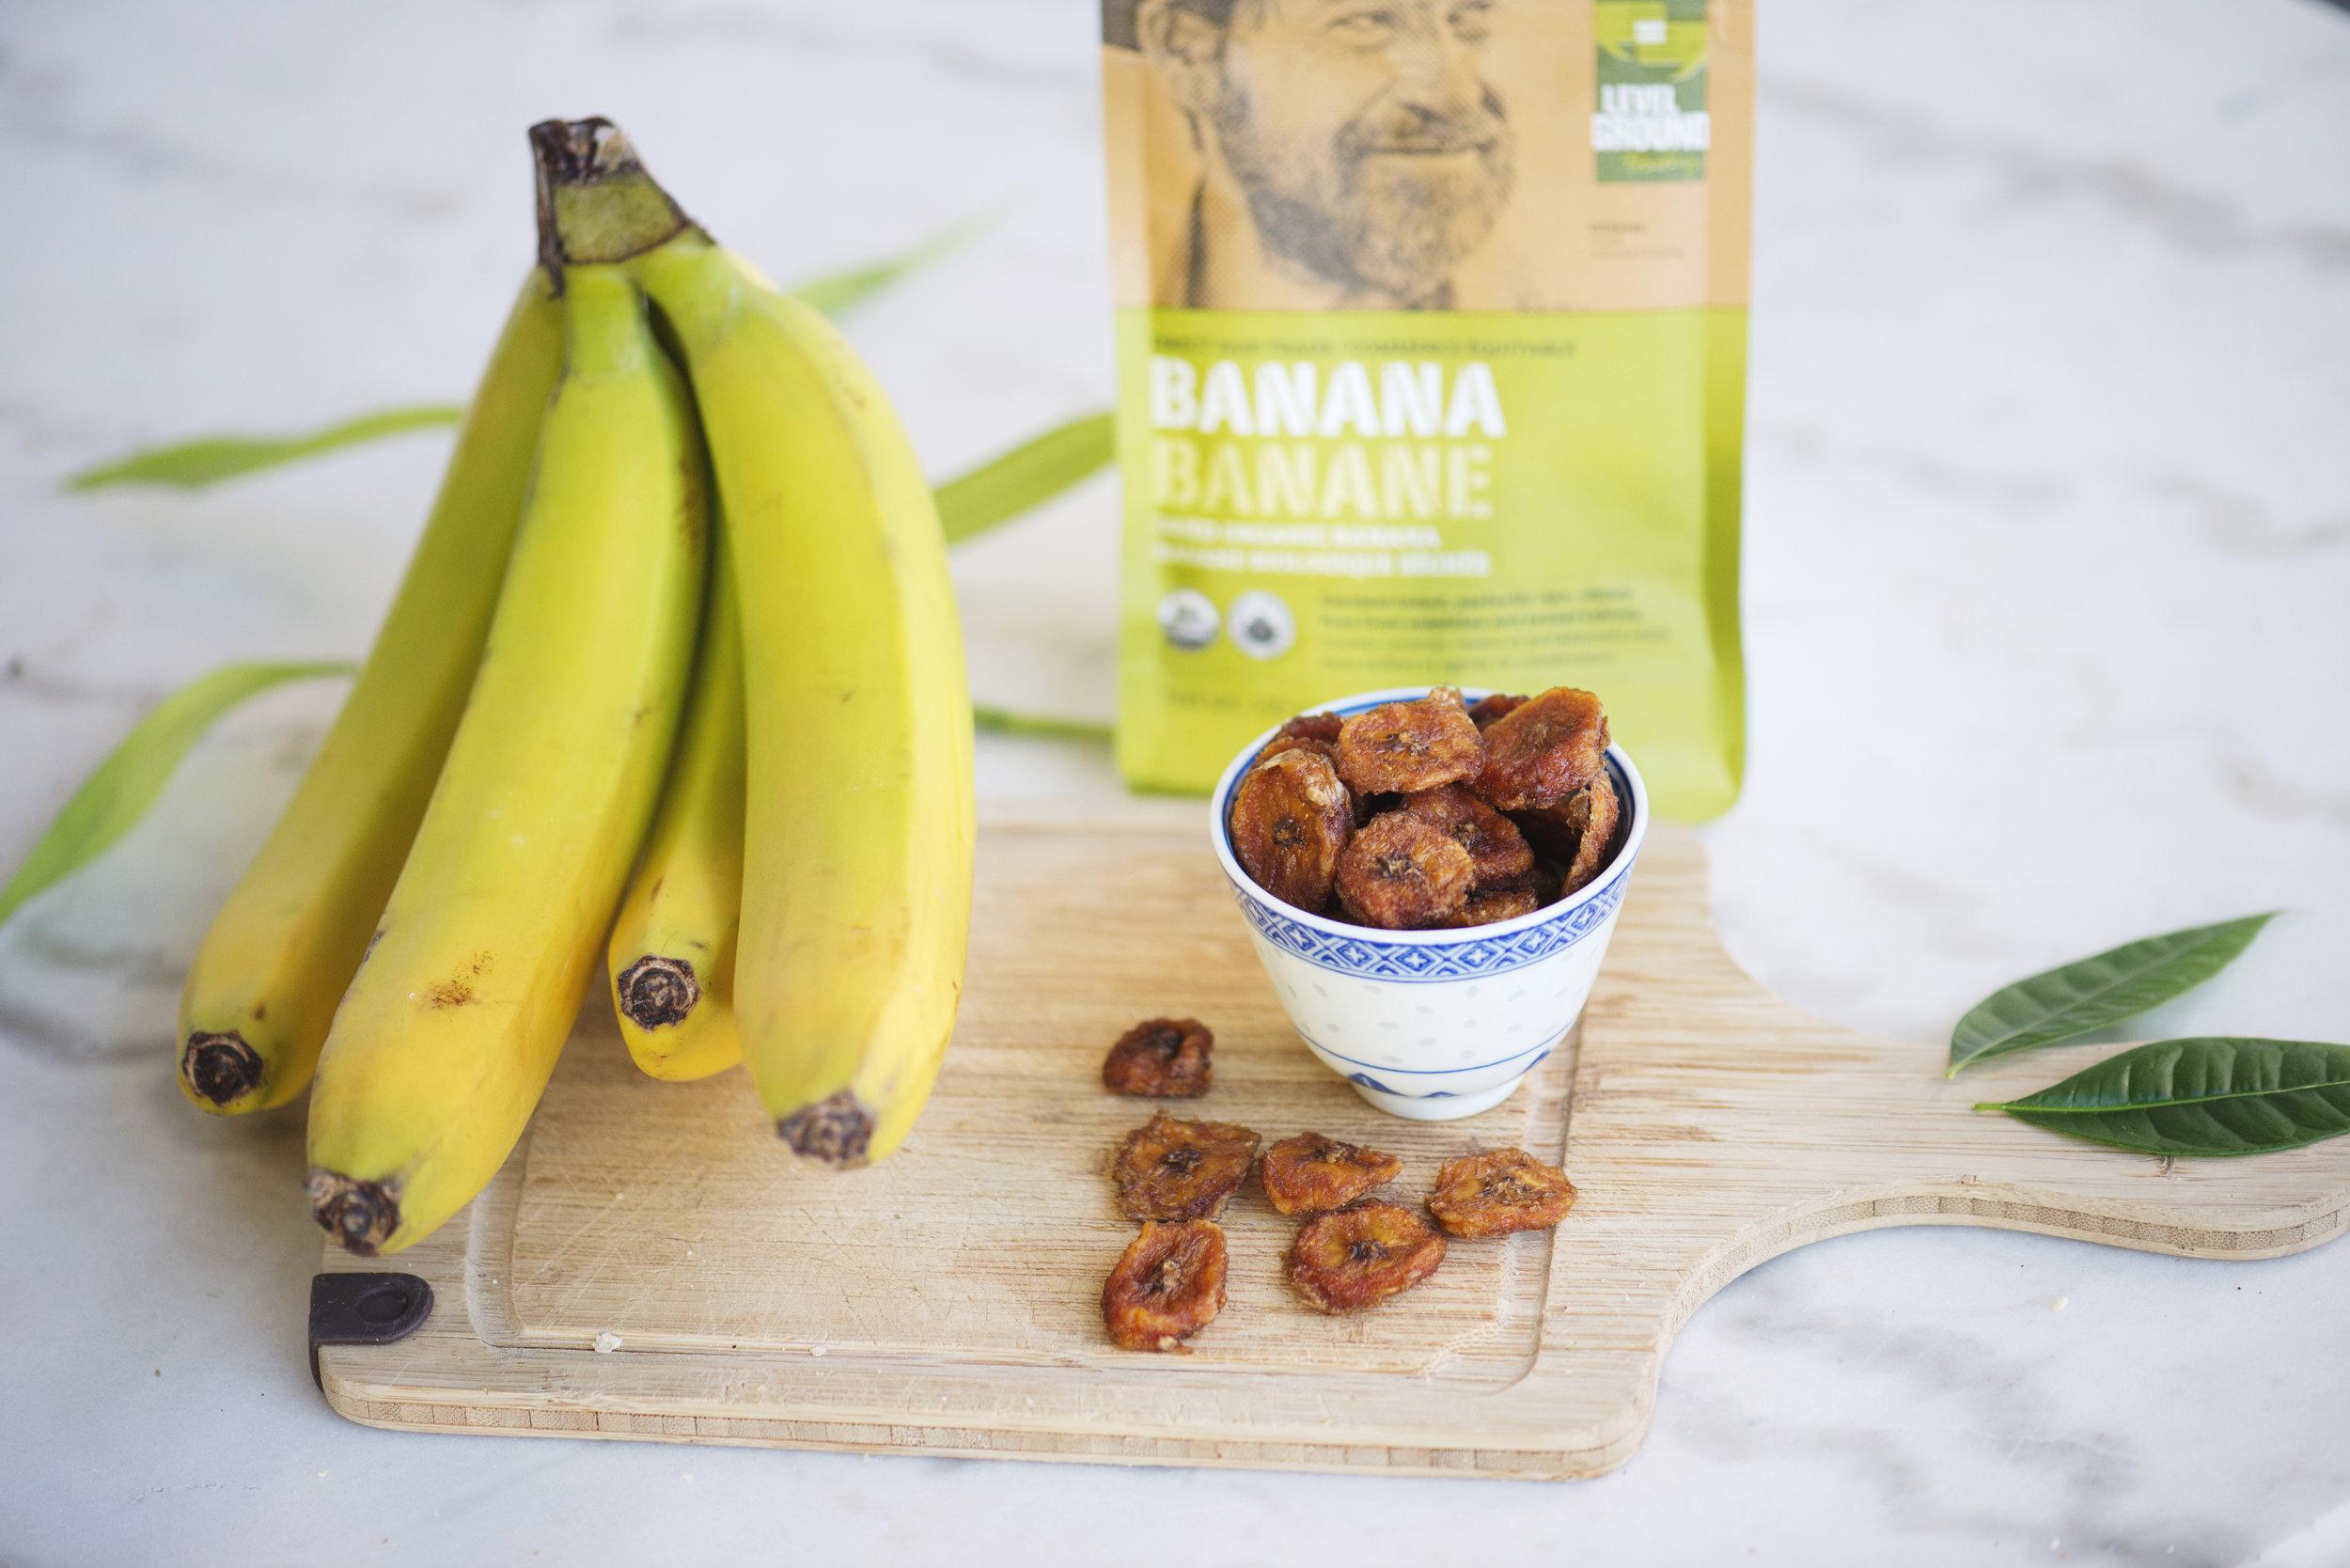 Level Ground banana package